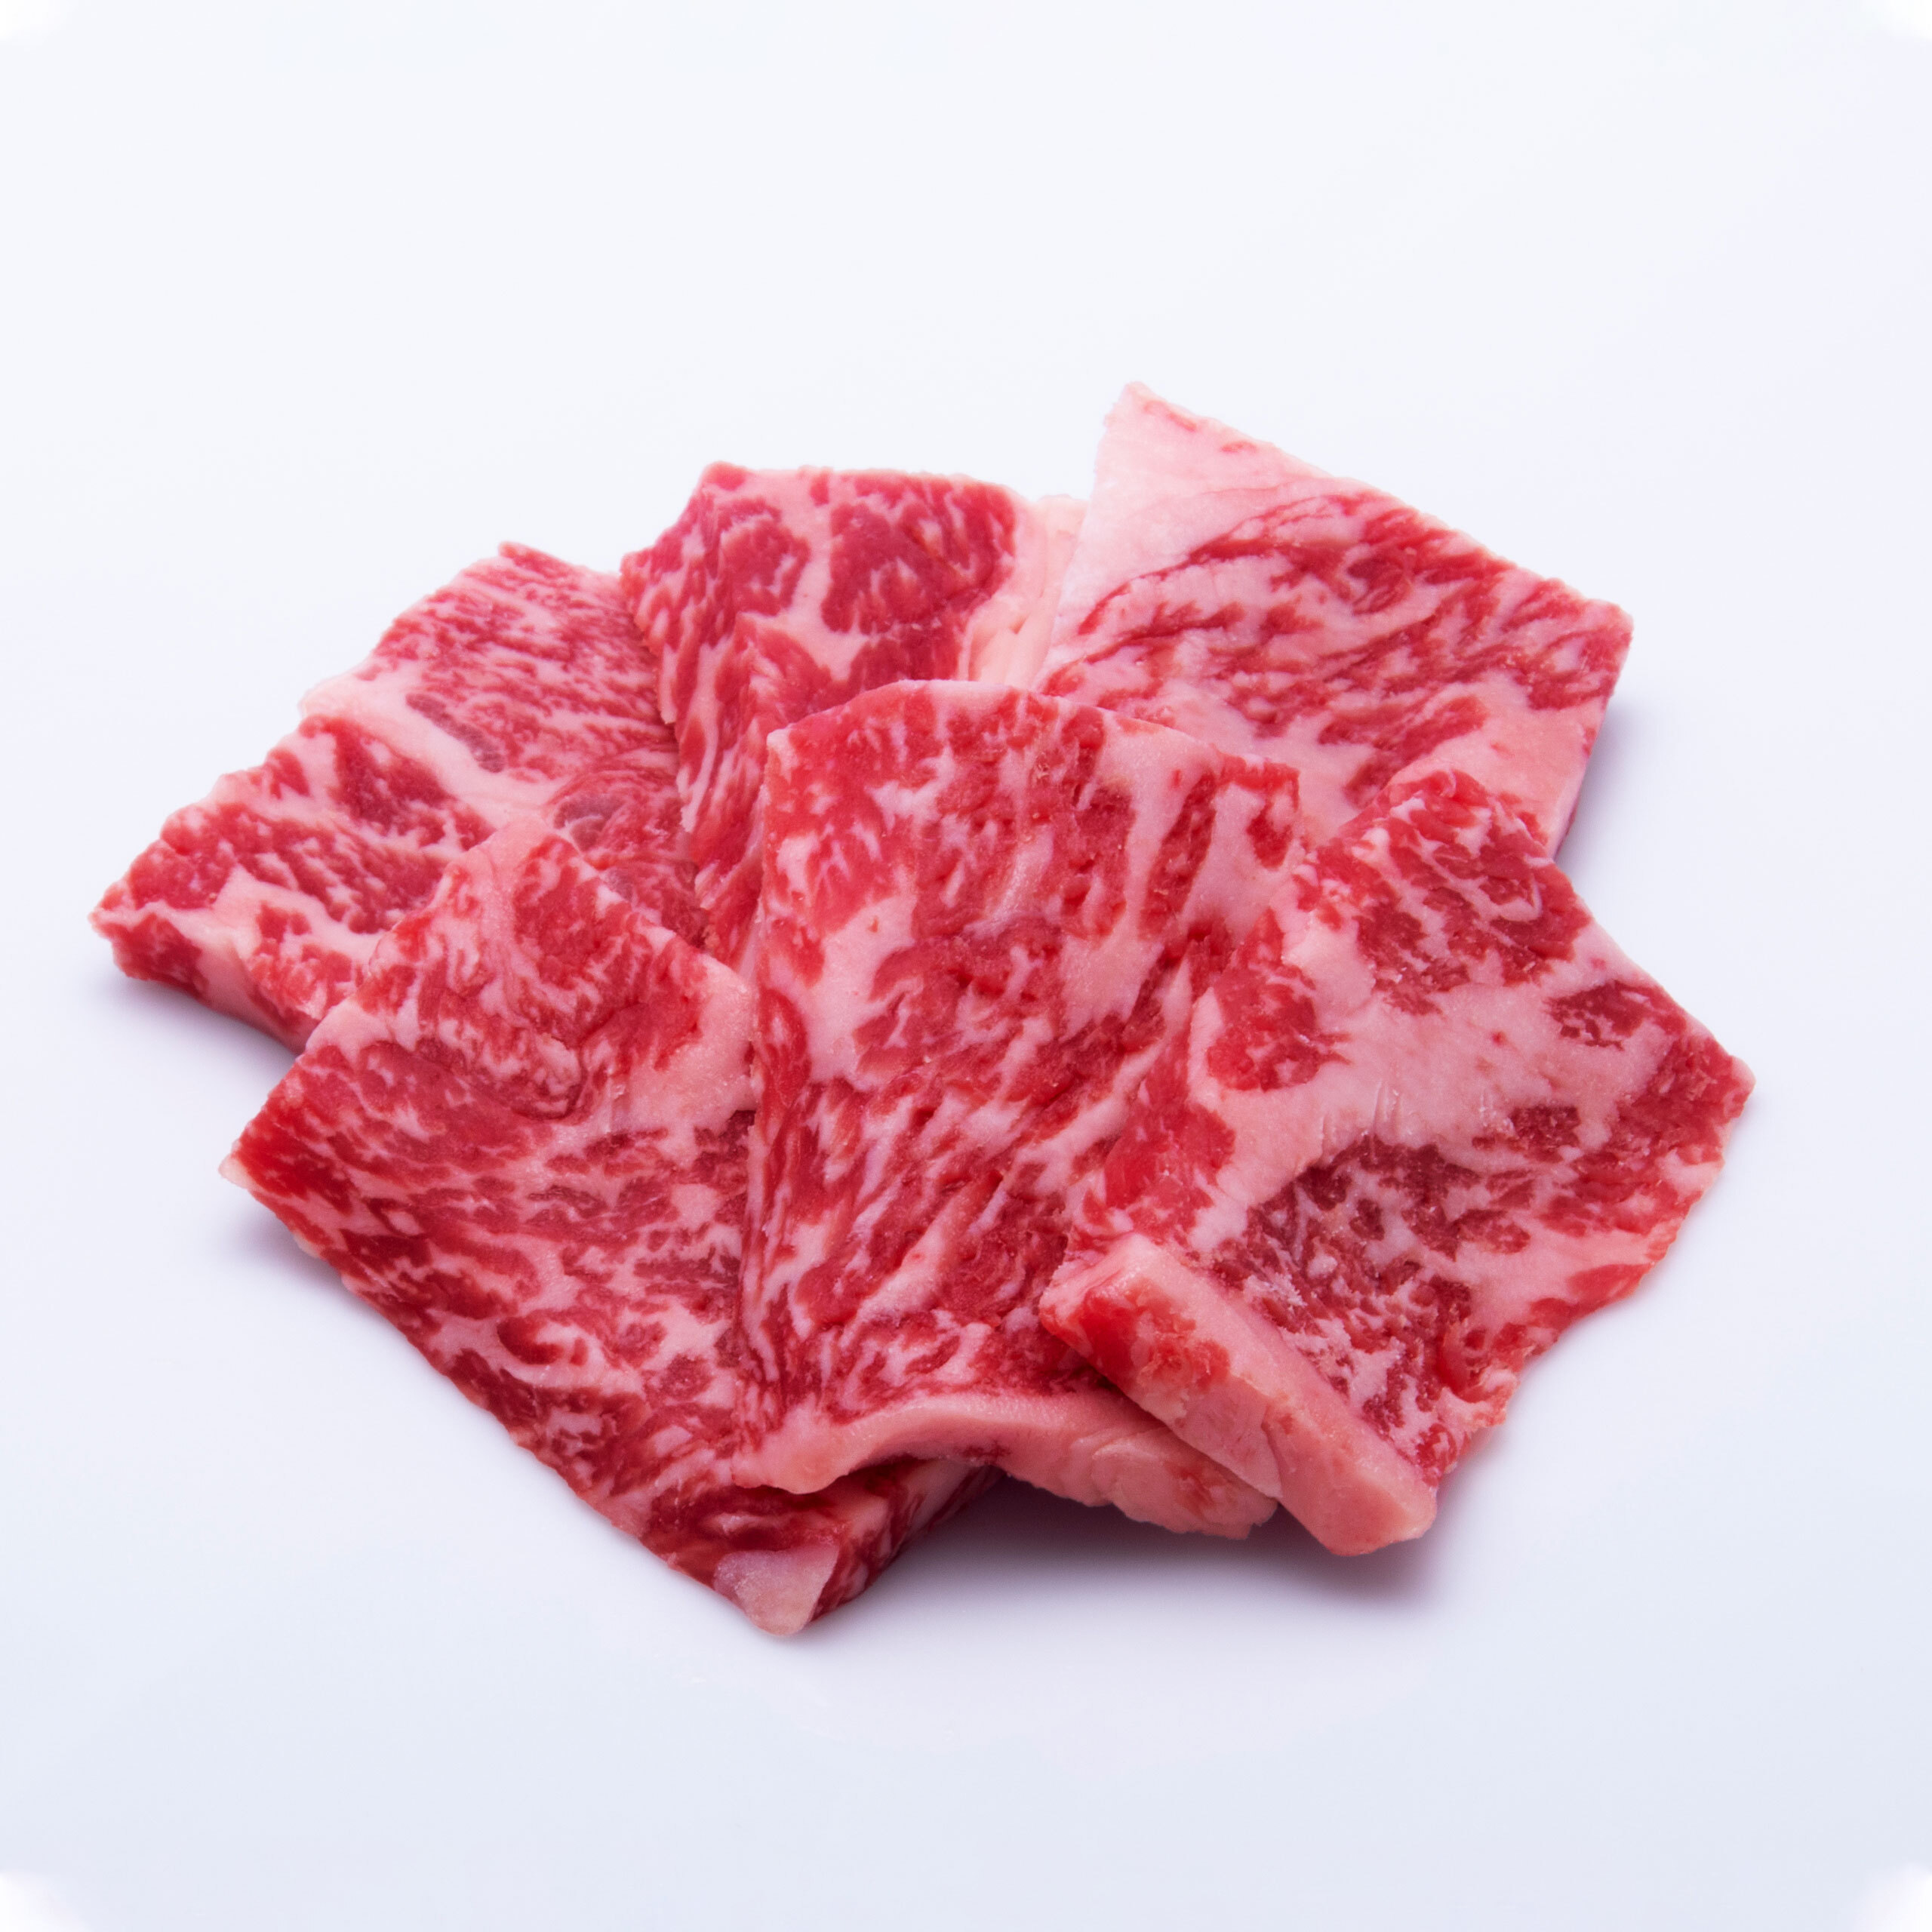 国産交雑種ロース|焼肉:100g